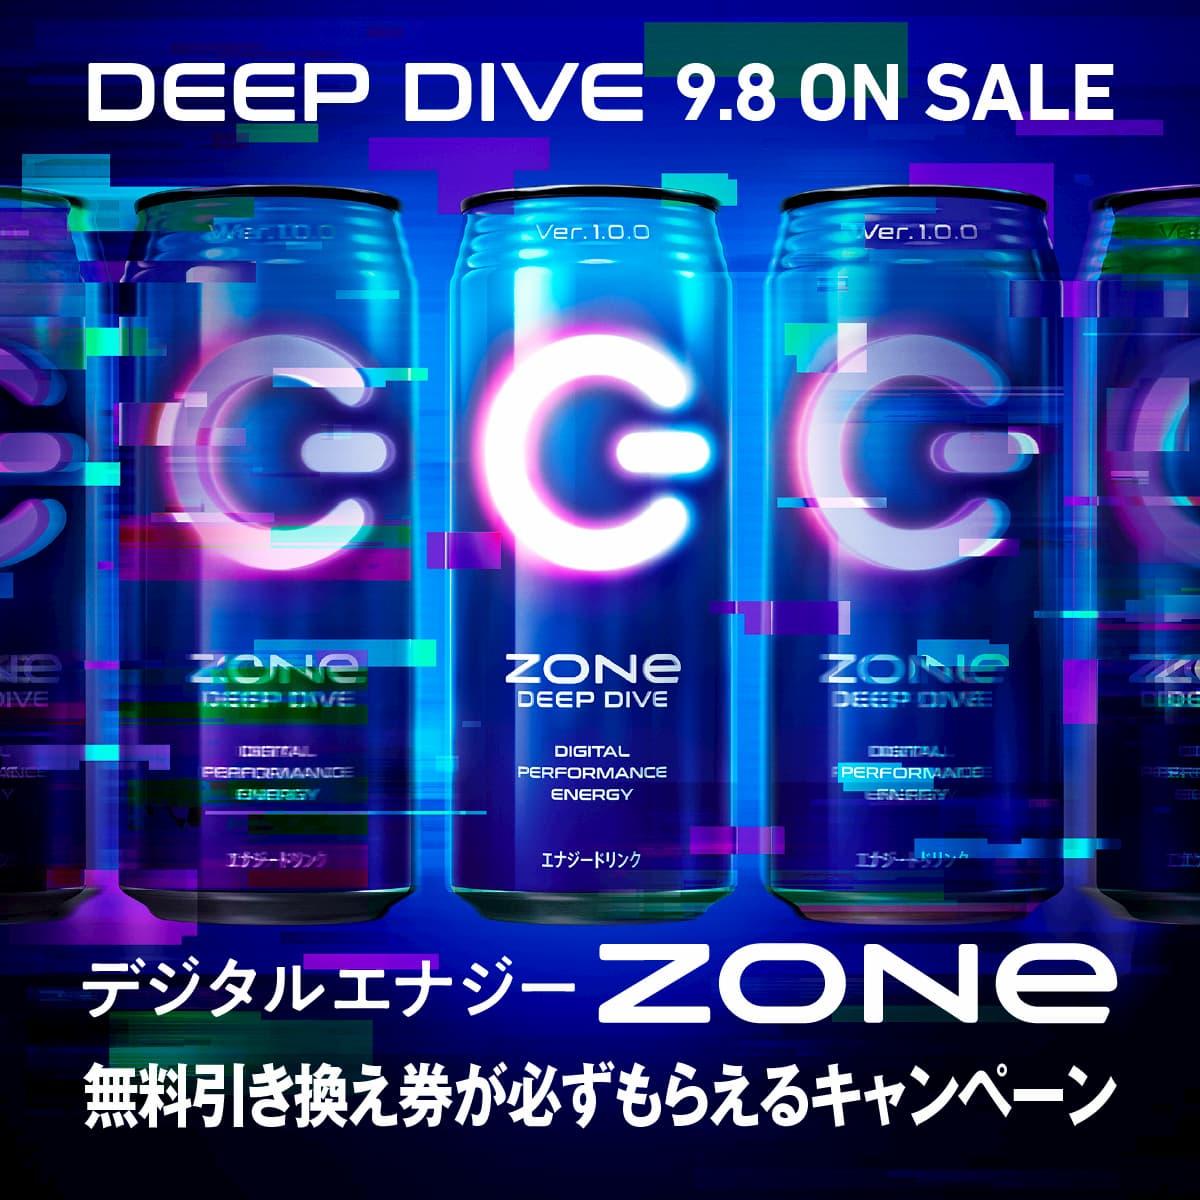 ZONe DEEPDIVE新発売直前キャンペーン